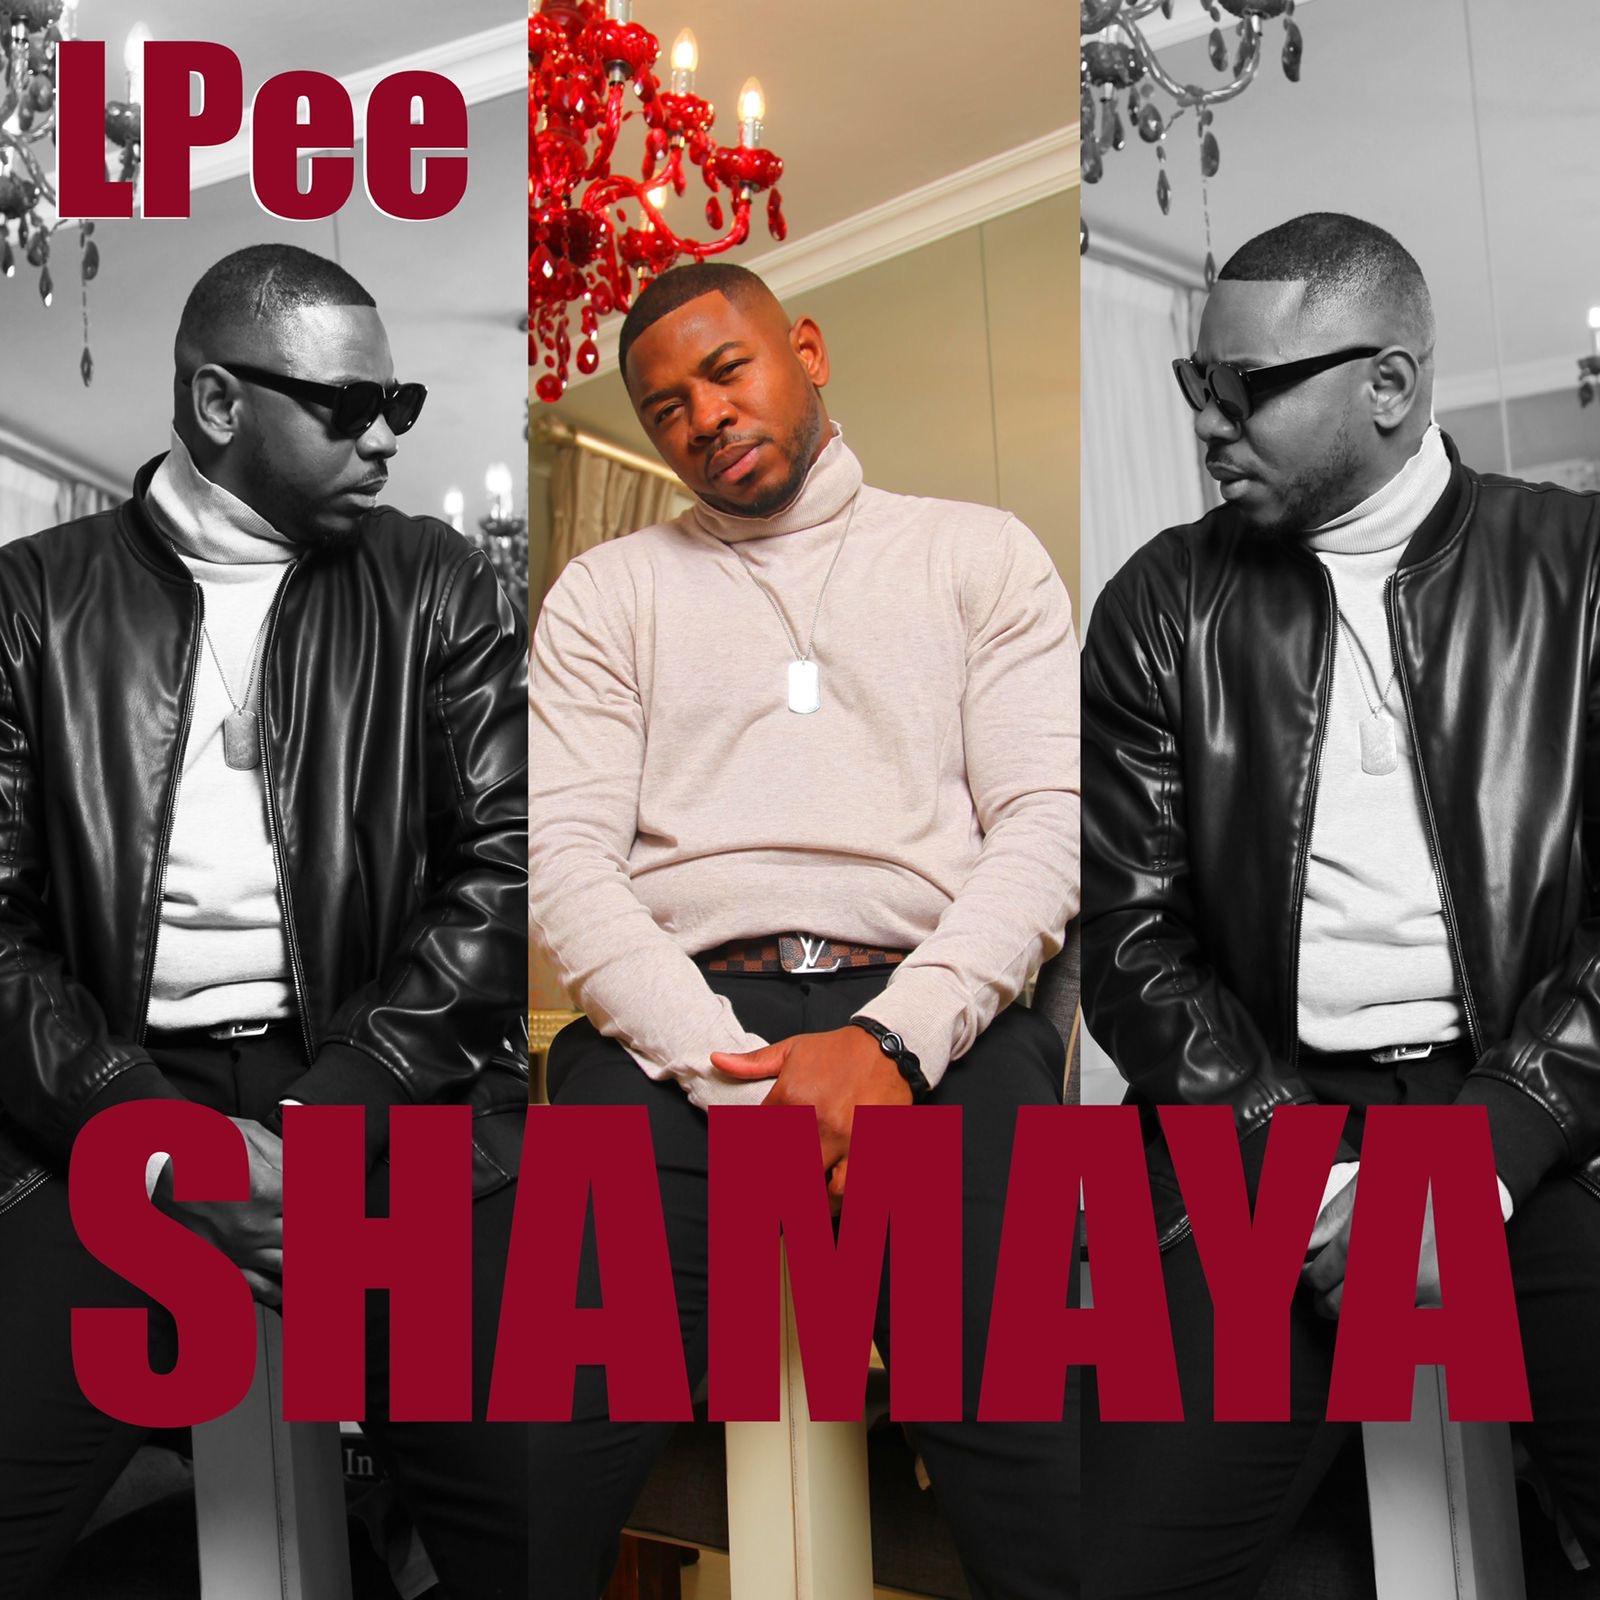 LPee - Shamaya Download